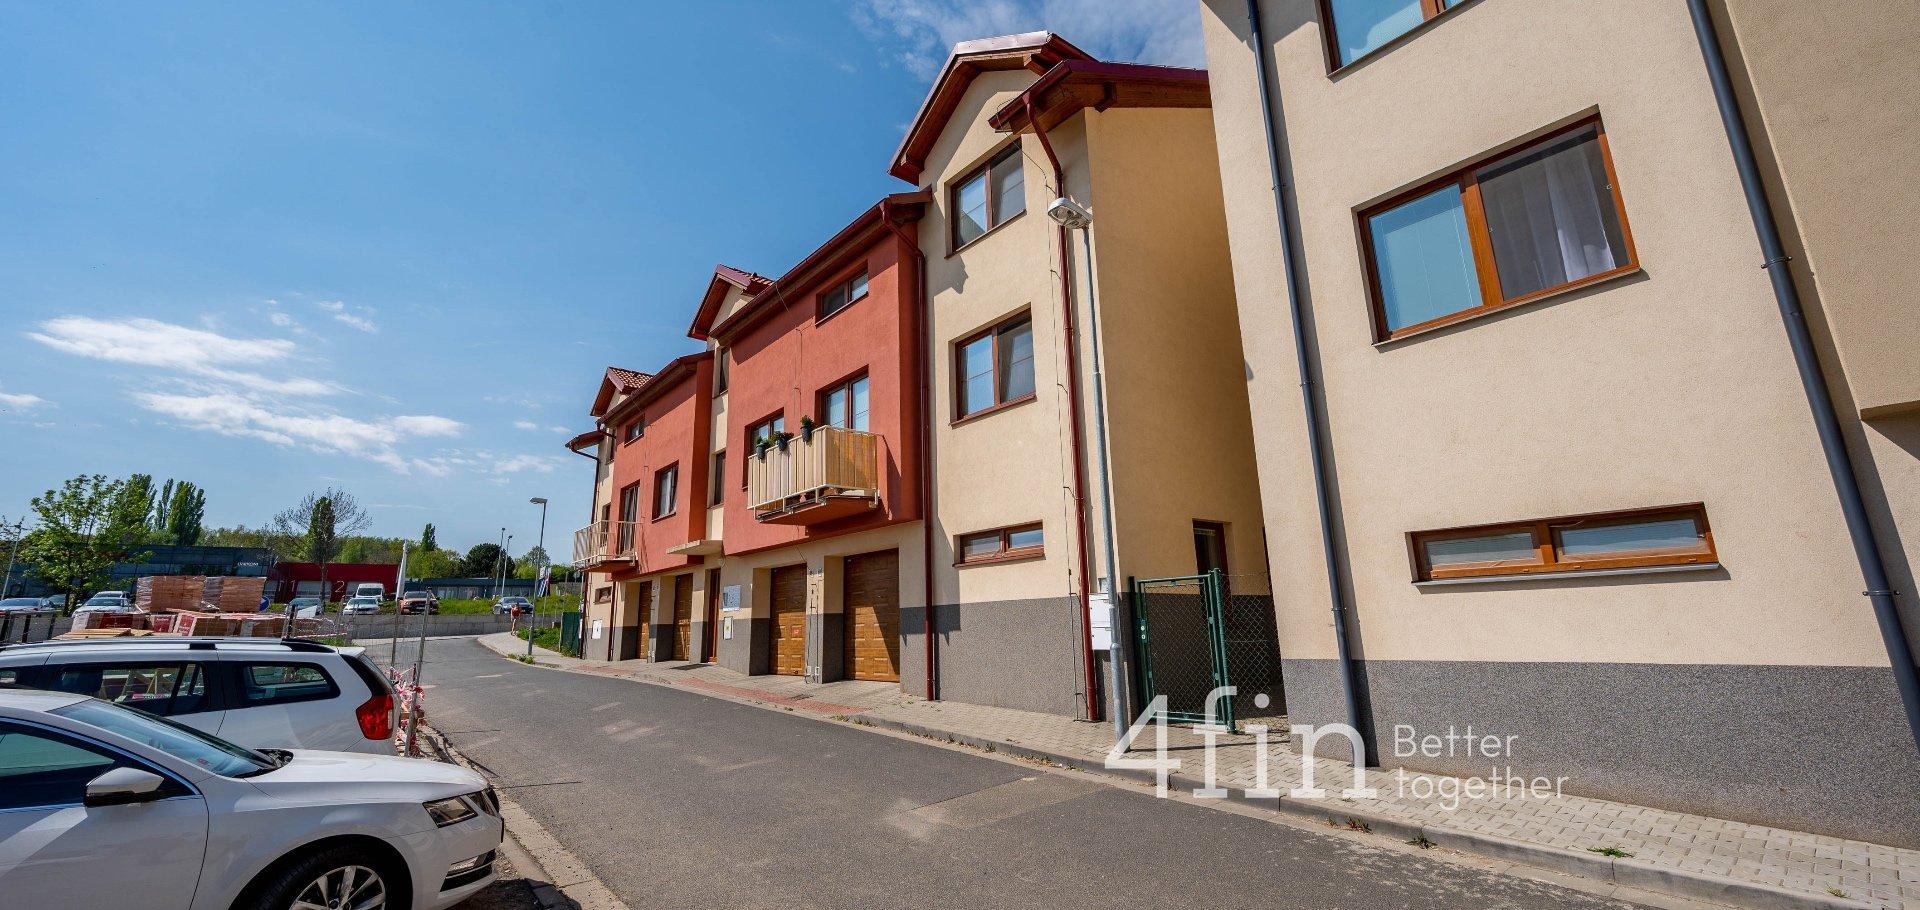 Byty v novostavbě 2+kk, 63m² s terasou 59m² - Kutná Hora - Karlov